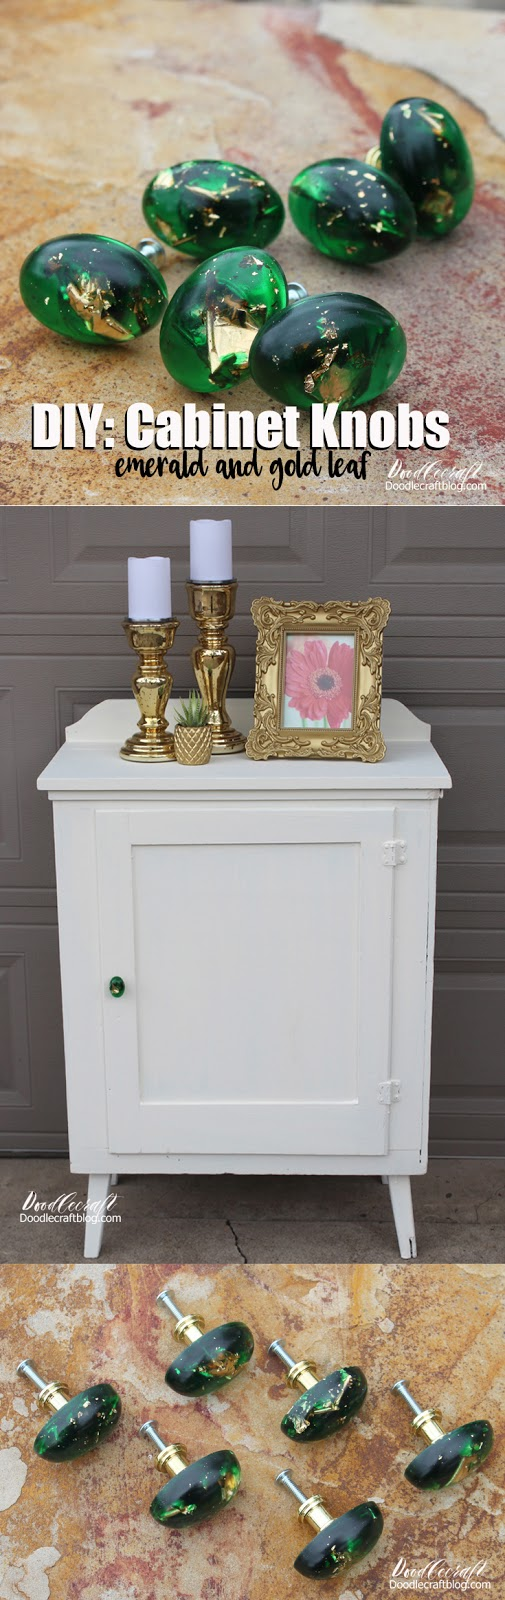 Floral Unicorn Switch Cover Cabinet knob Night Light Home Decor